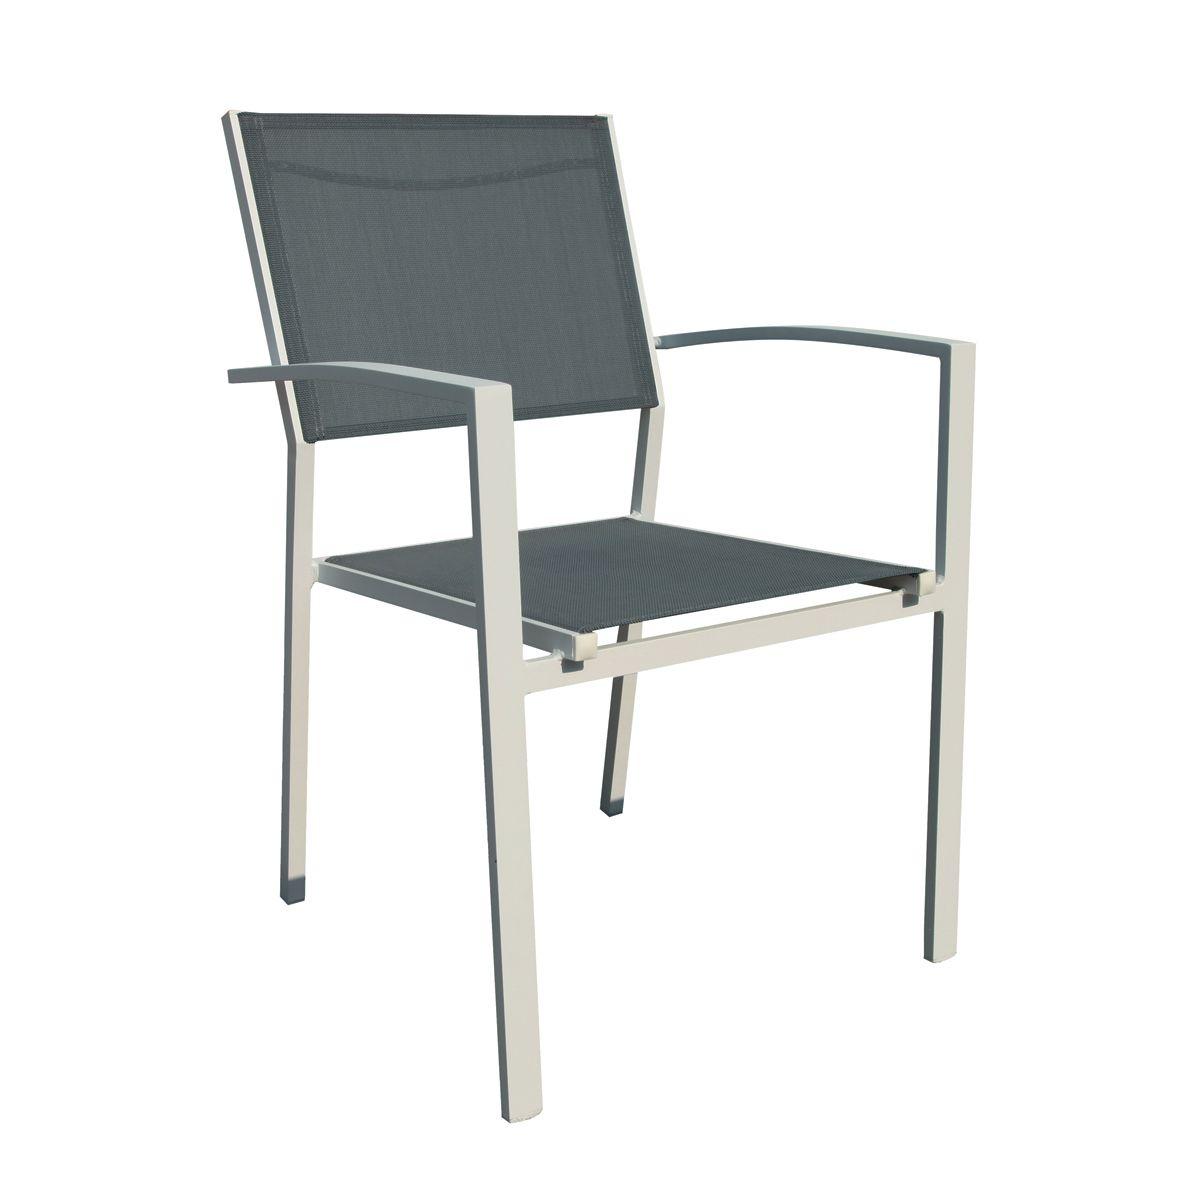 Awesome sedie in plastica da giardino gallery for Leroy merlin sedie esterno